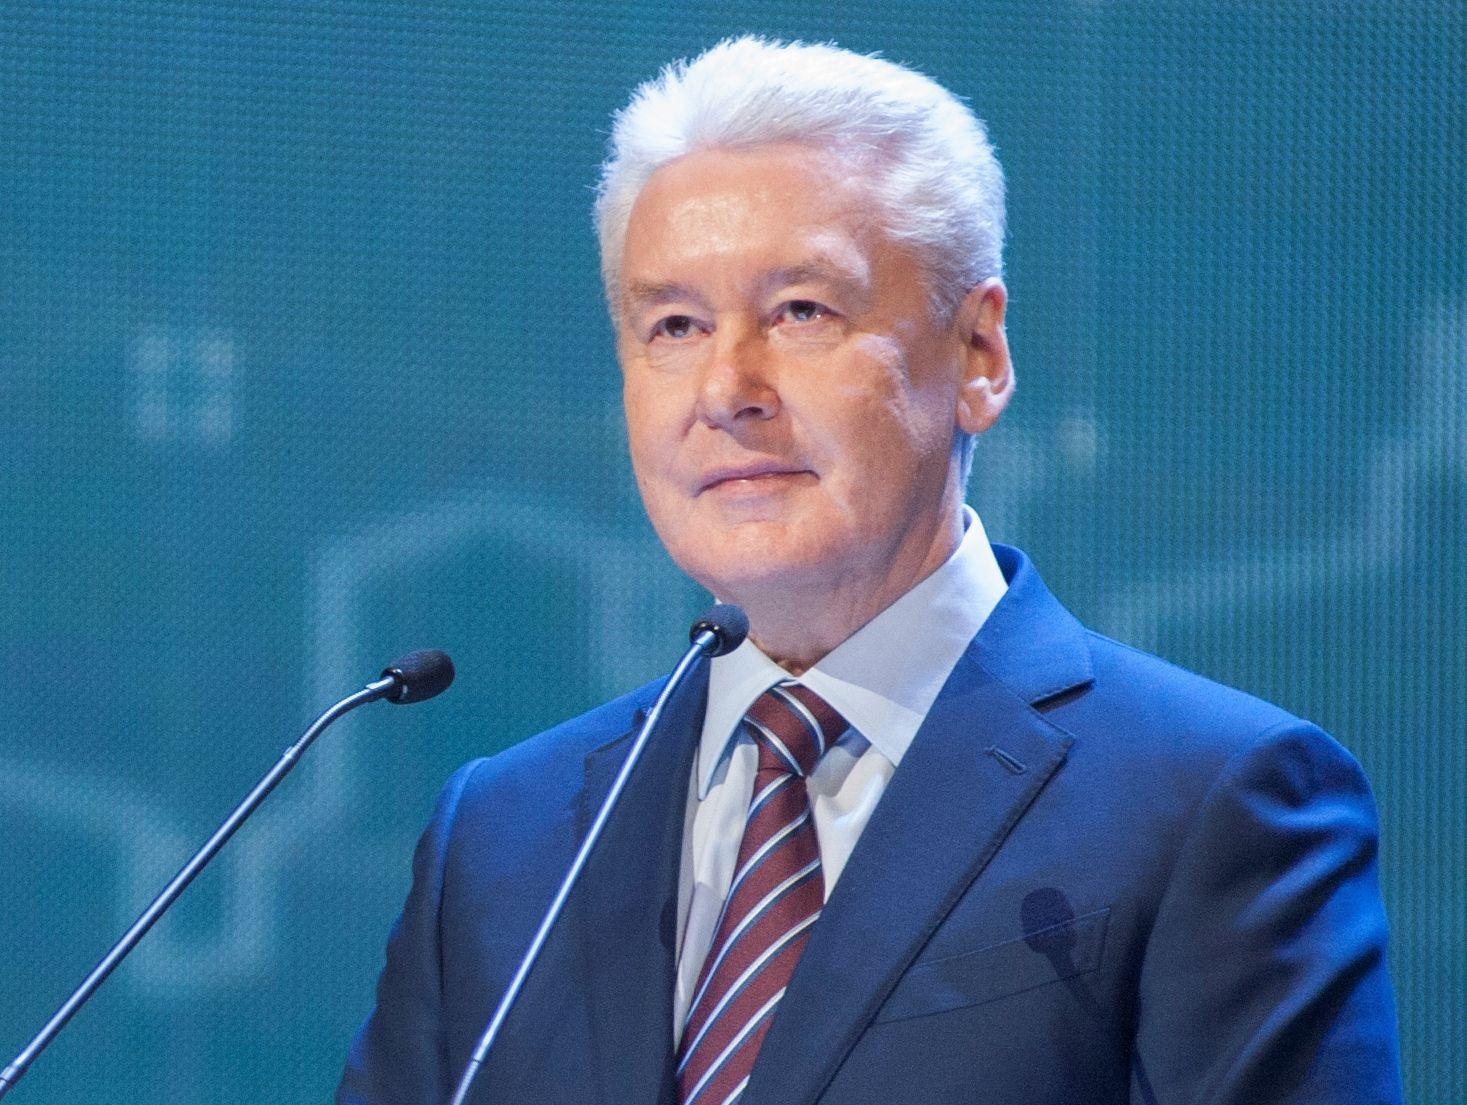 Сергей Собянин объявил о запуске девяти станций красной линии метро на три дня раньше